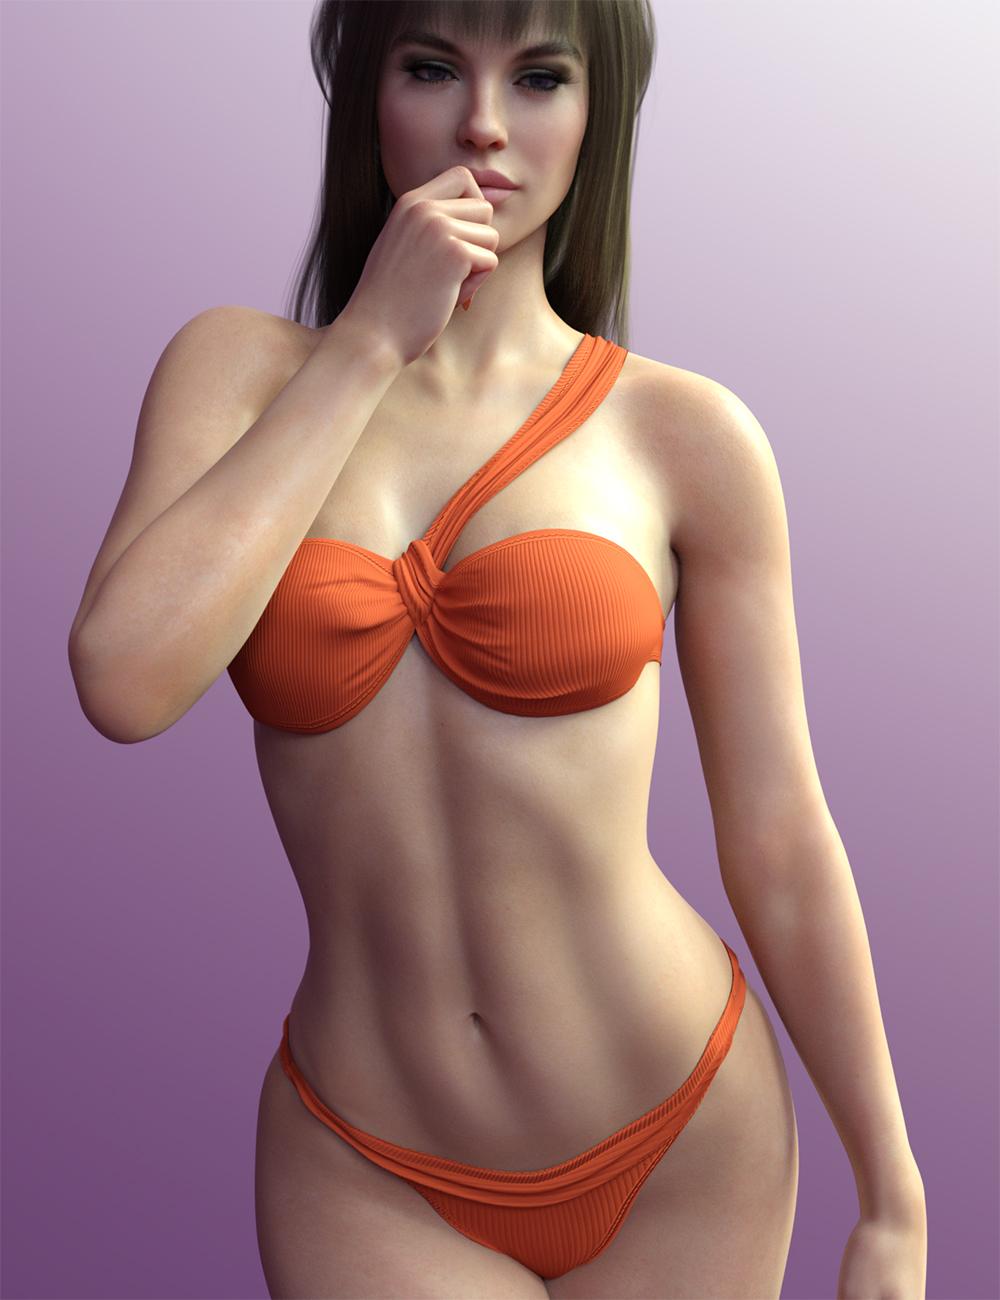 X-Fashion the Feminine Bikini by: xtrart-3d, 3D Models by Daz 3D